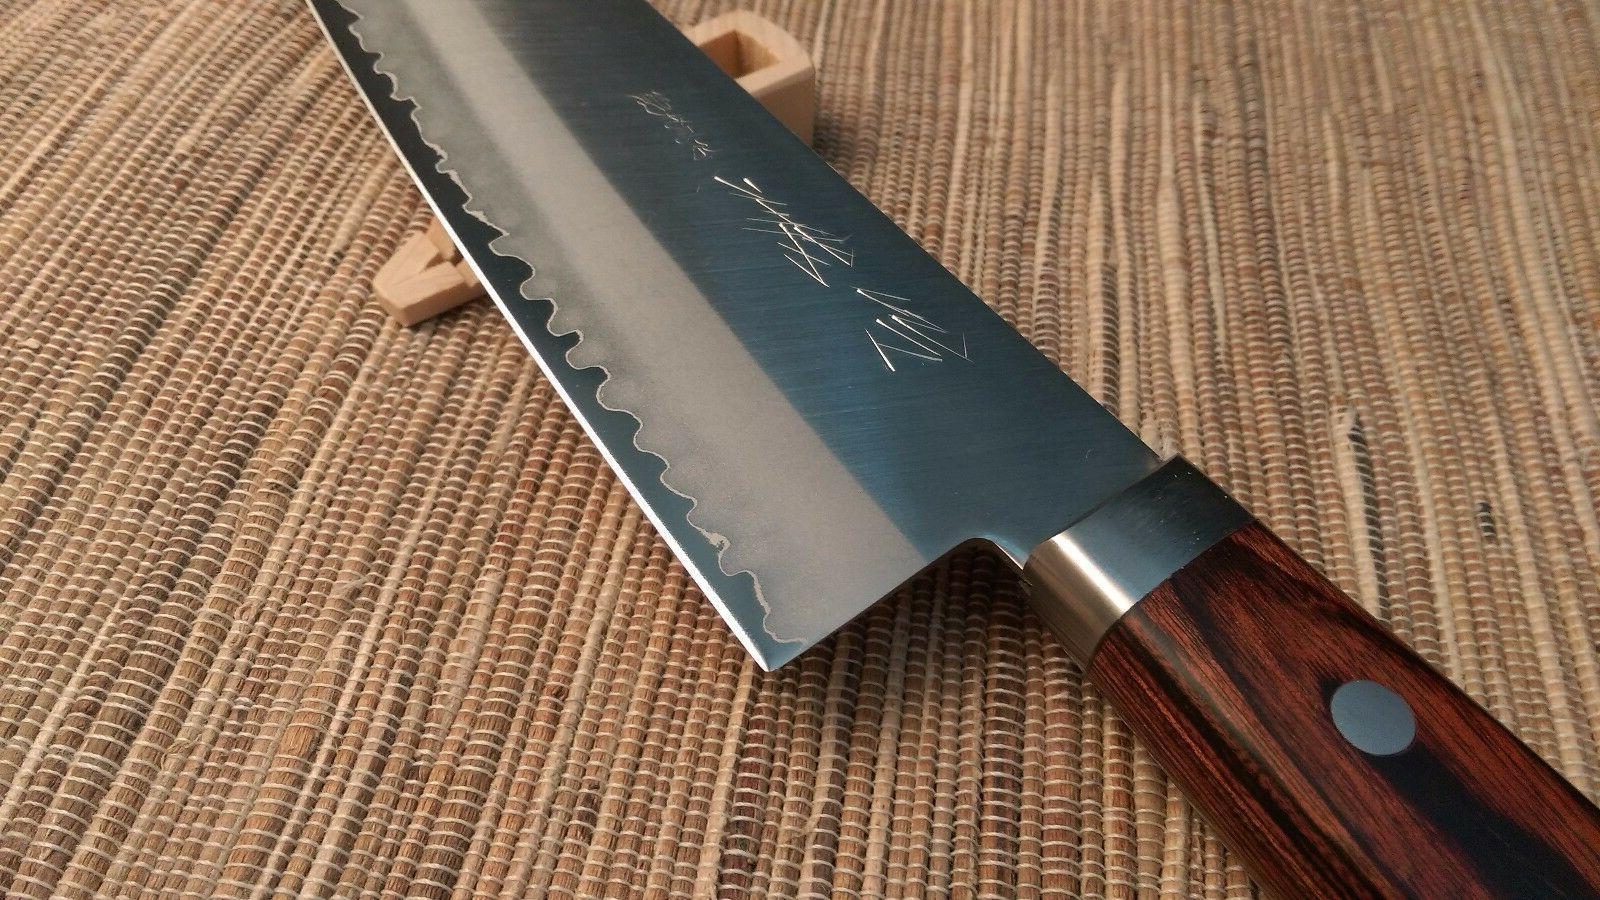 Sakai Knives: Yoshihiro Gold